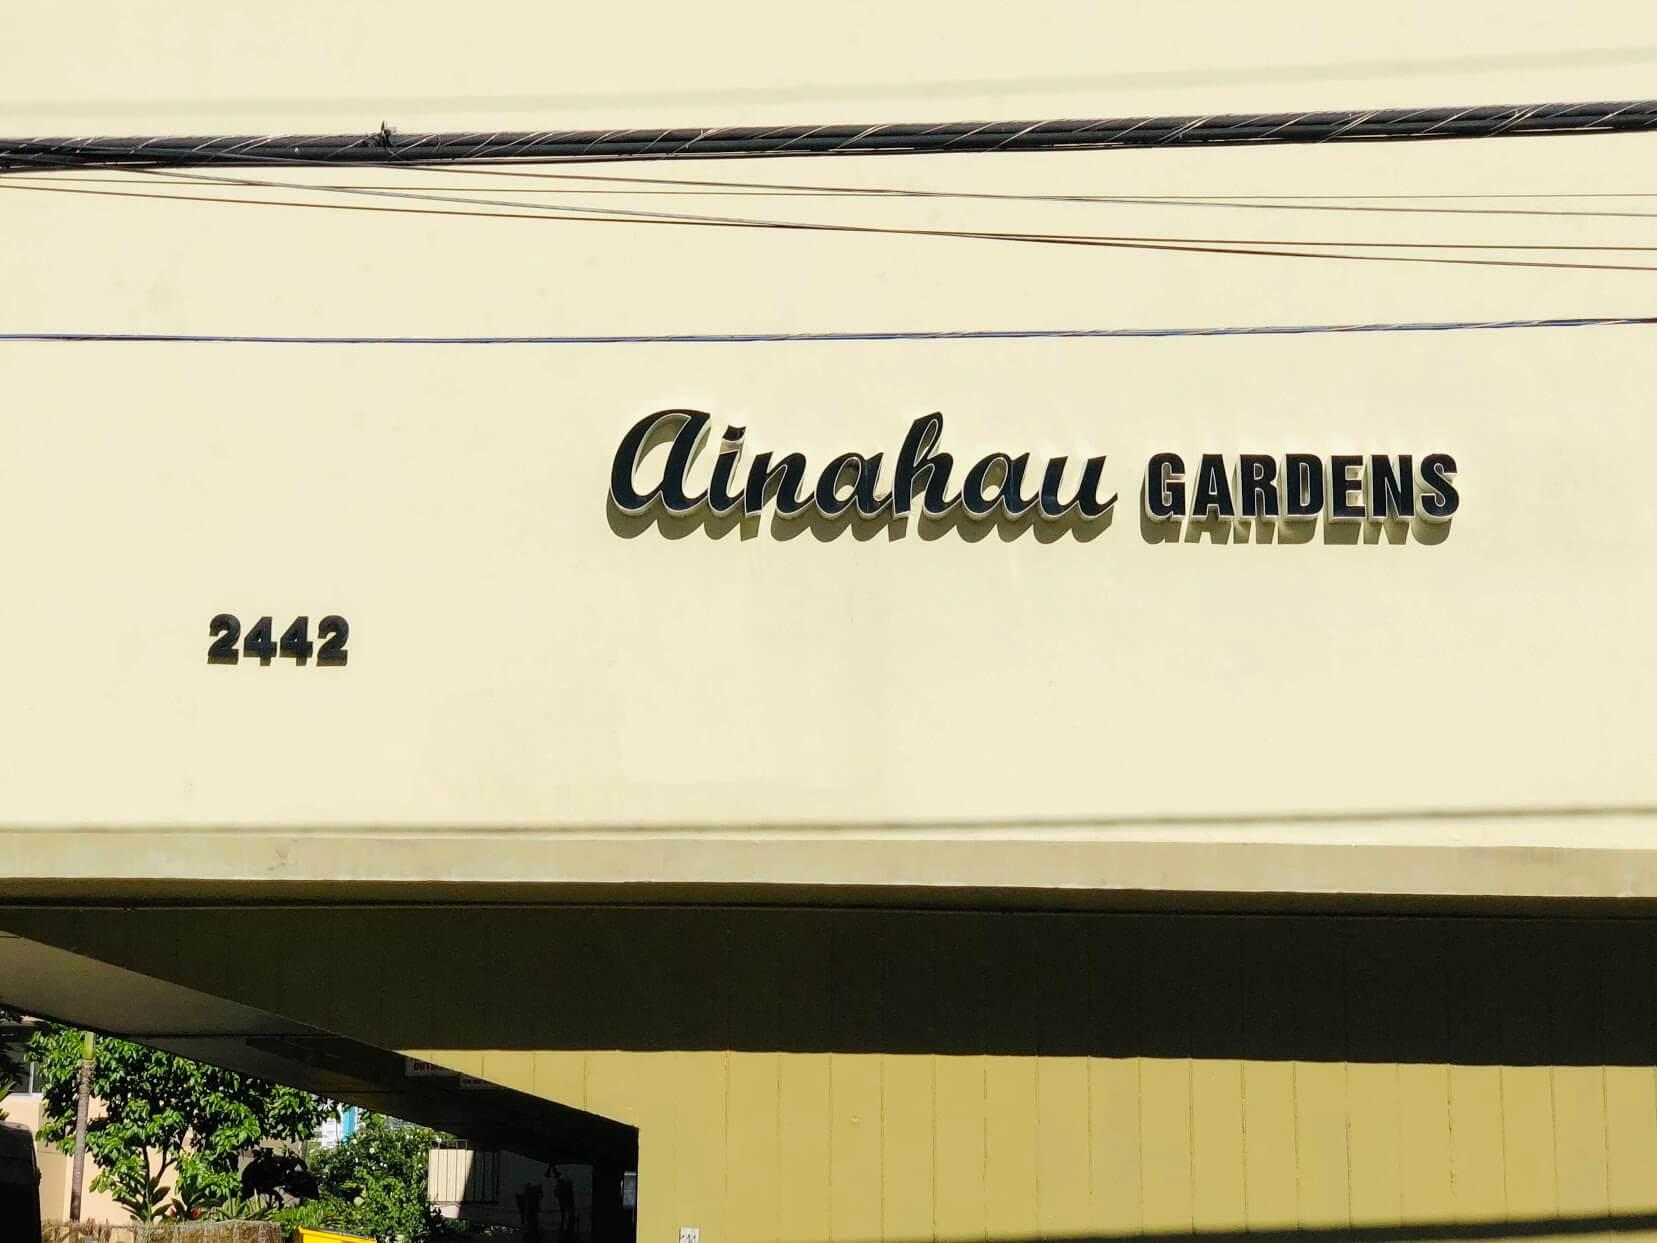 Ainahau Gardensの看板